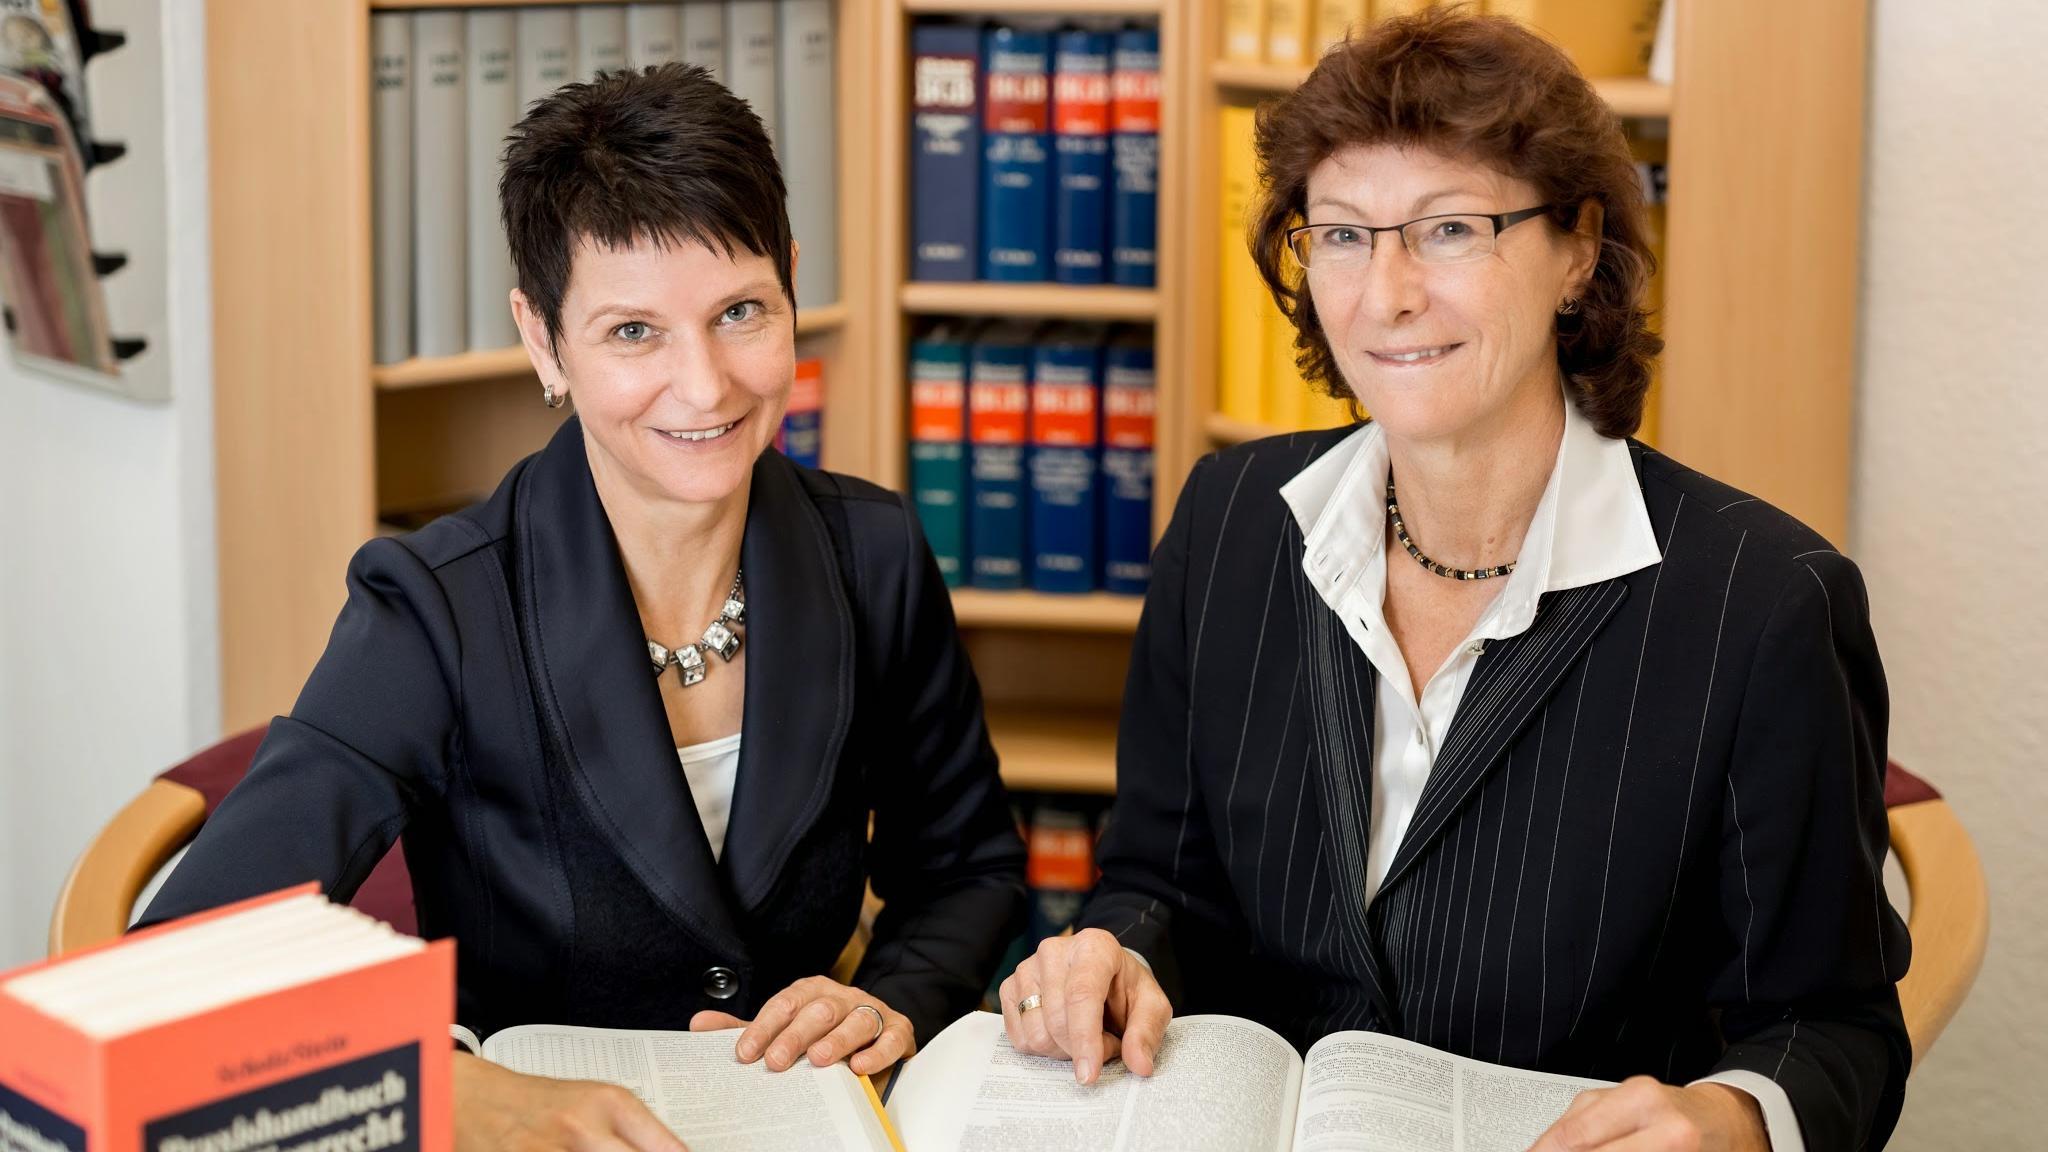 Rechtsanwaltskanzlei Appenrodt & Alpers, Hegelstraße in Magdeburg